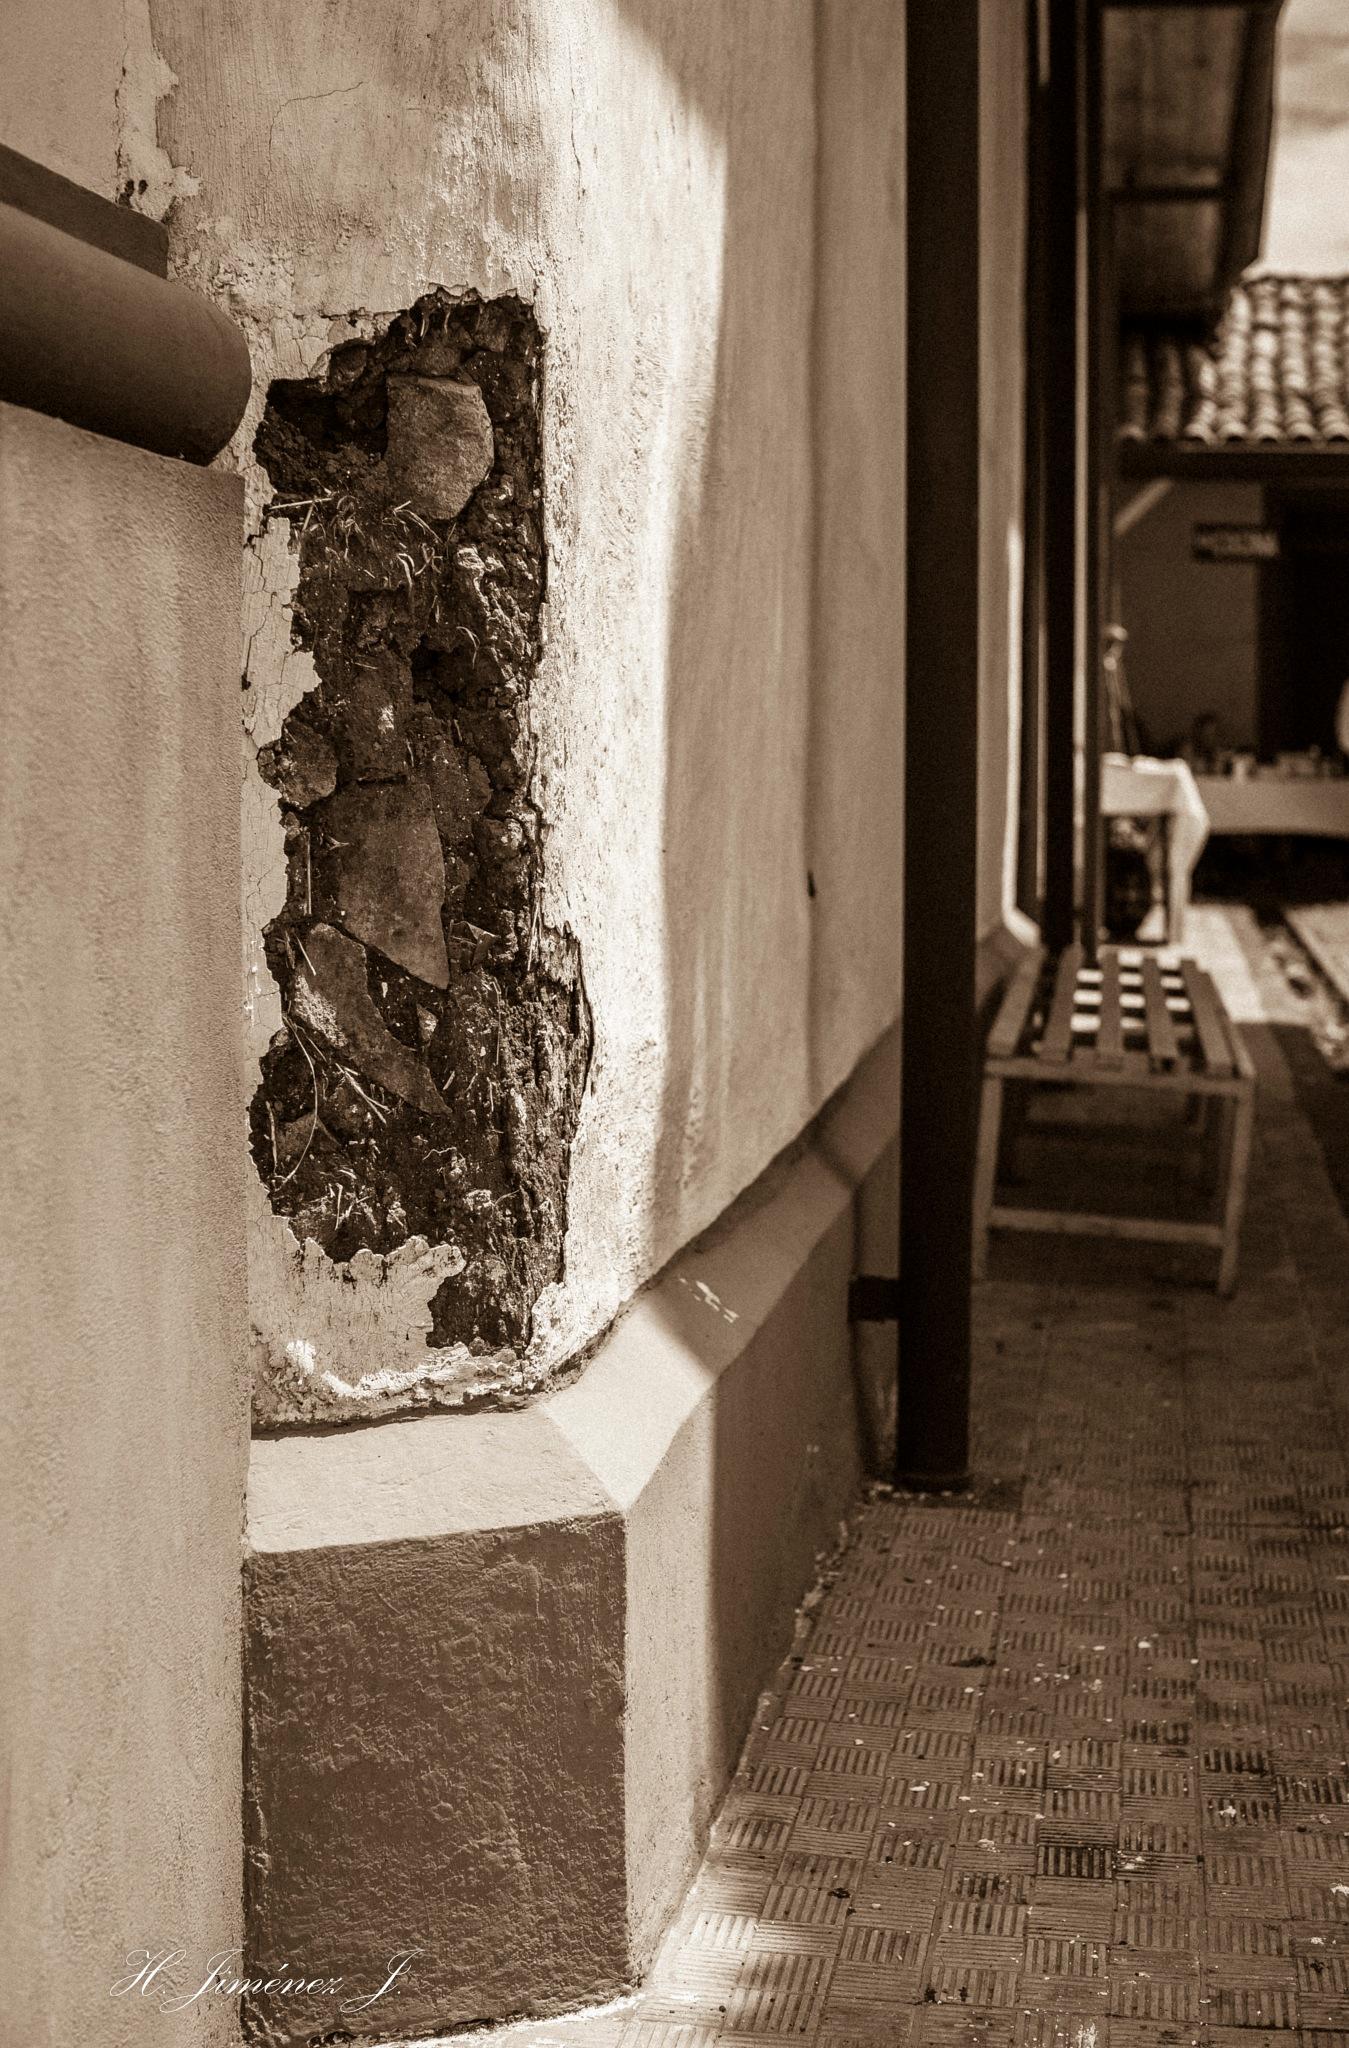 La esquina rota. by Henry Jiménez J